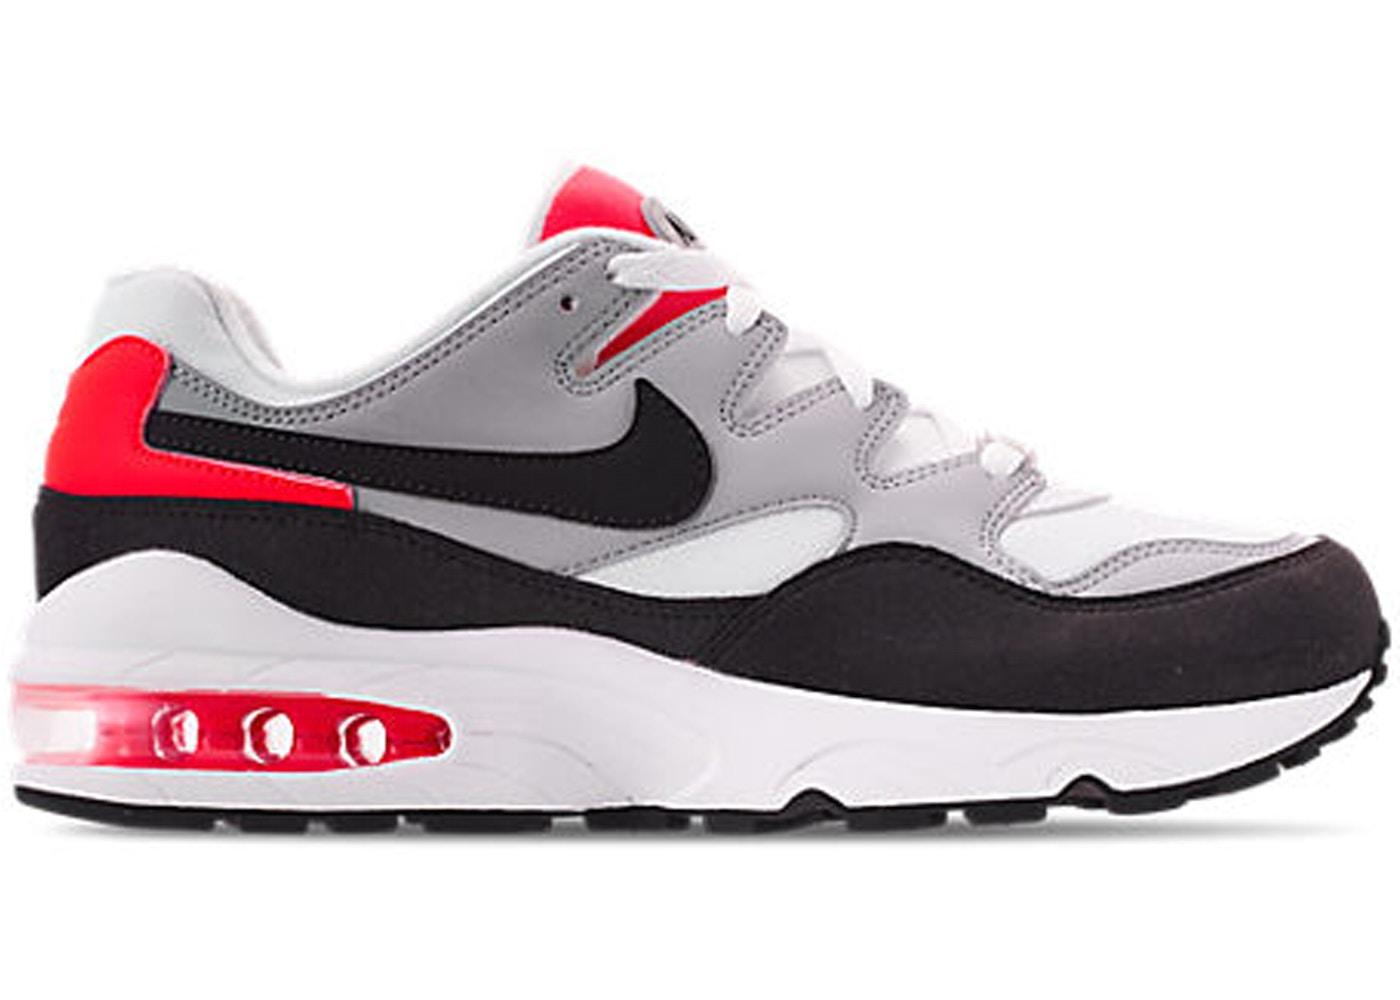 Nike Air Max 94 Wolf Grey Bright Crimson - 747997-006